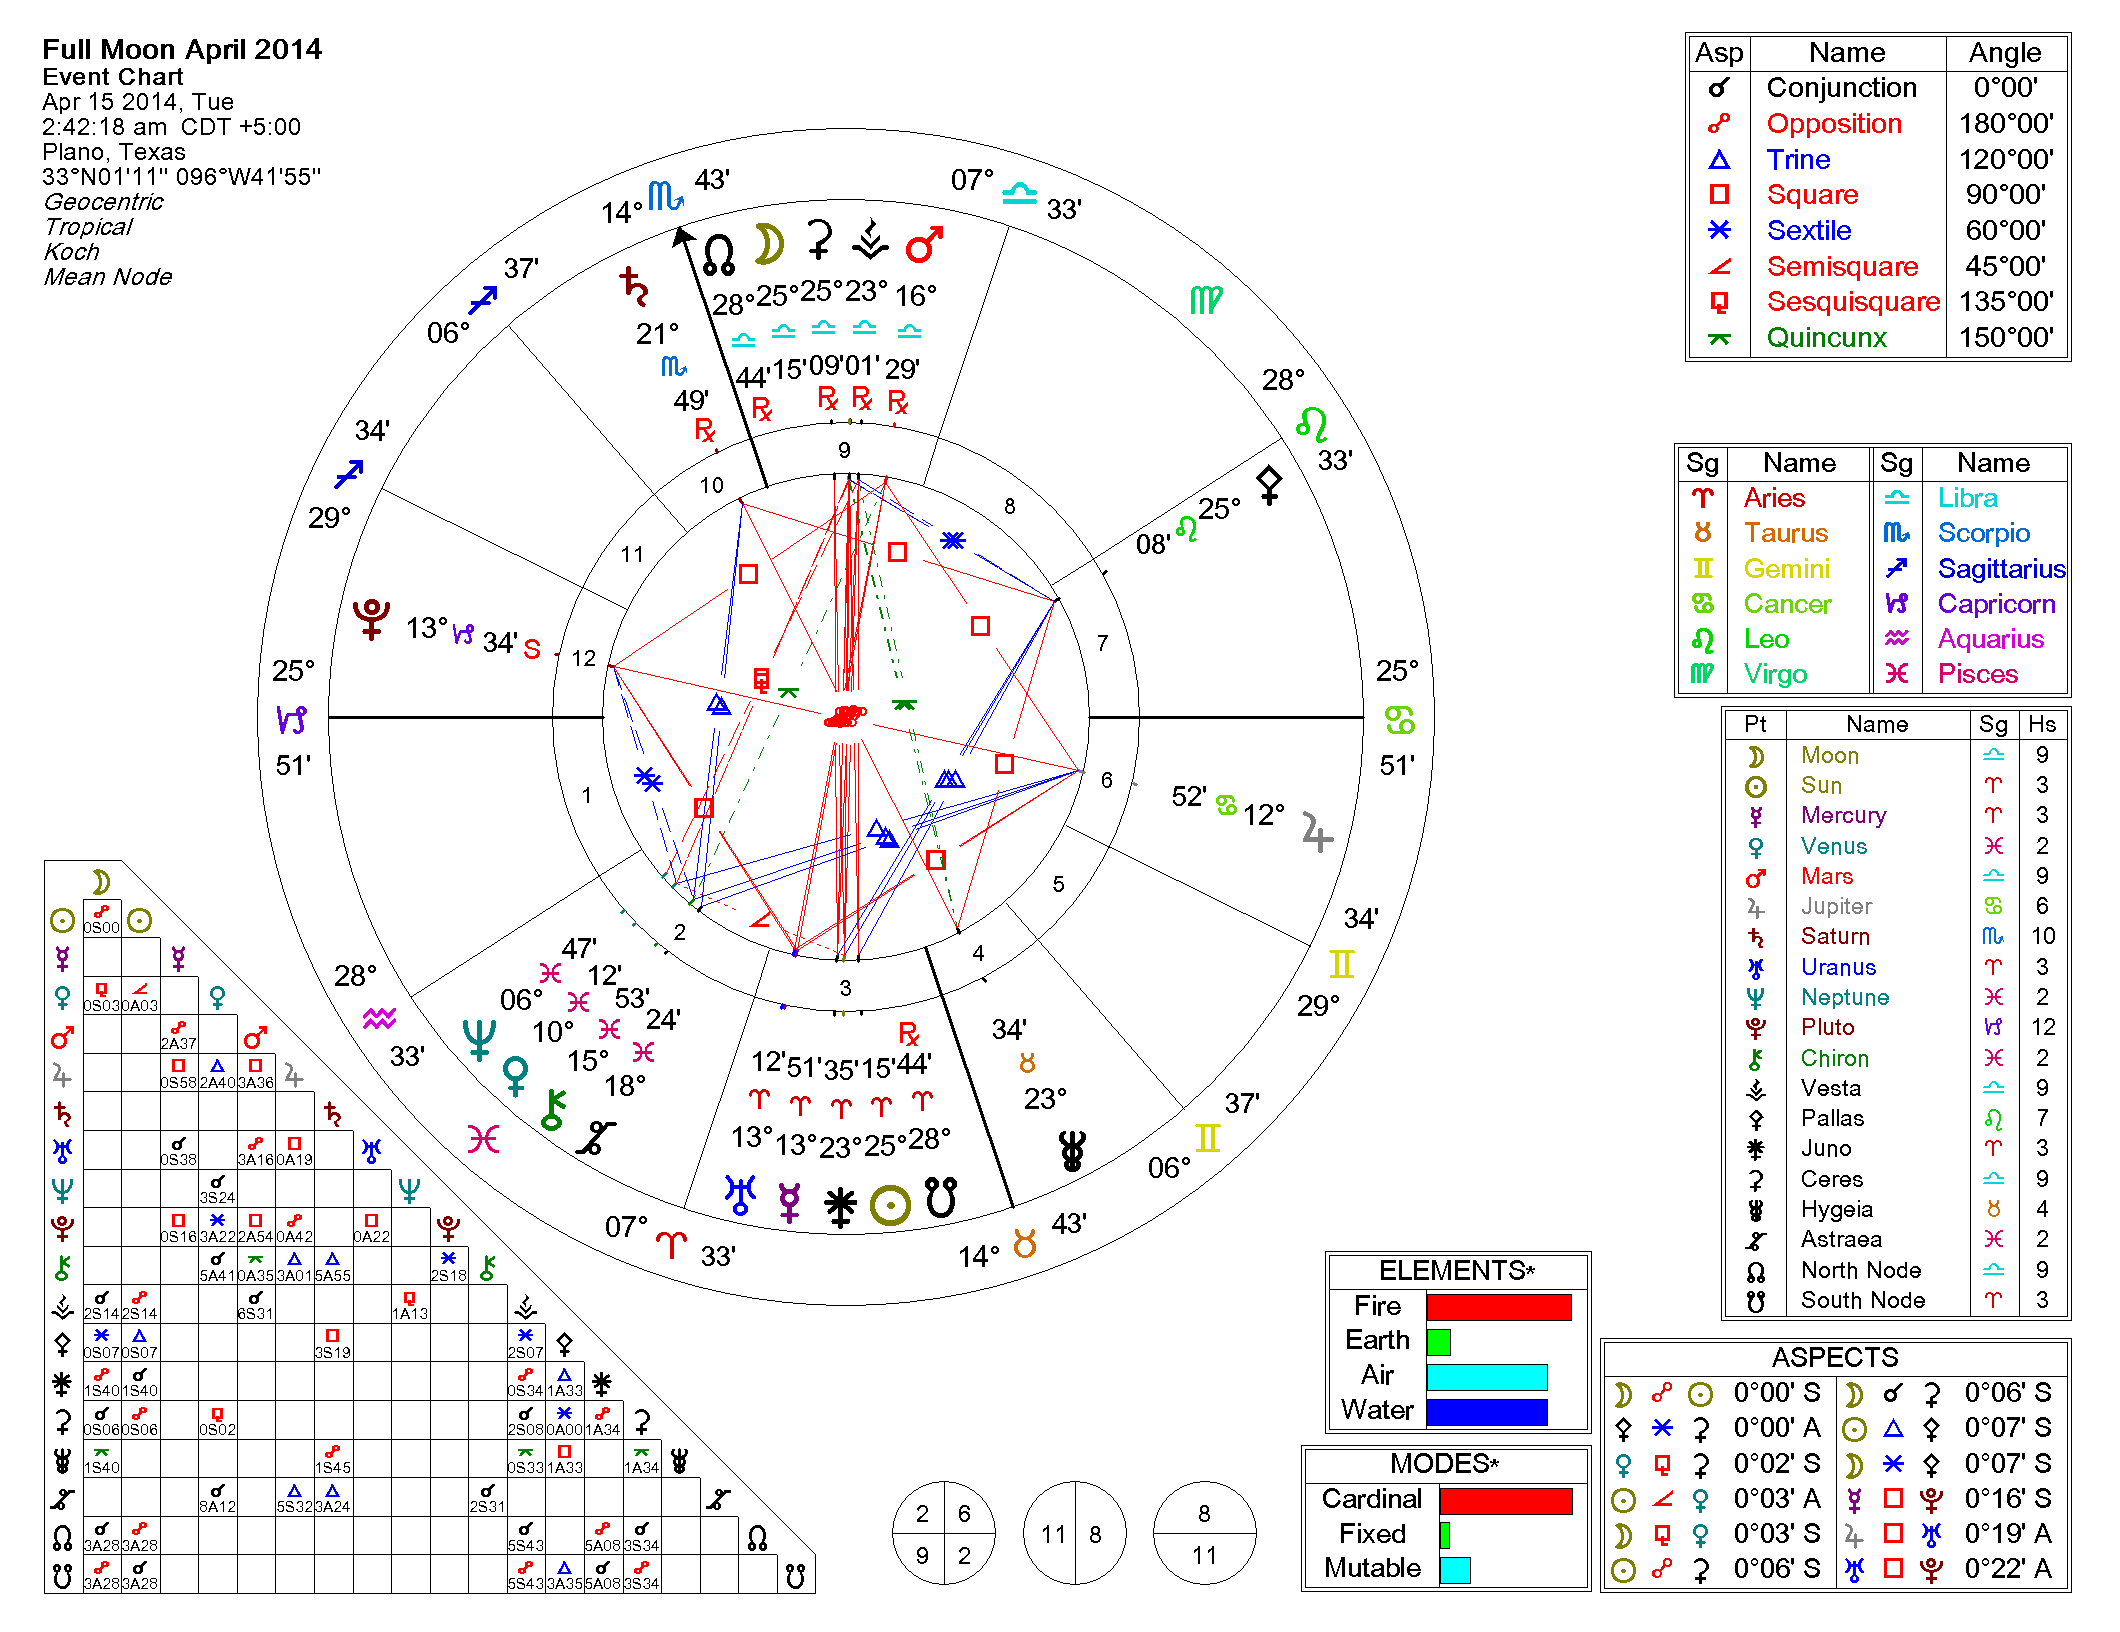 2017 Full Moon Calendar - Space.com